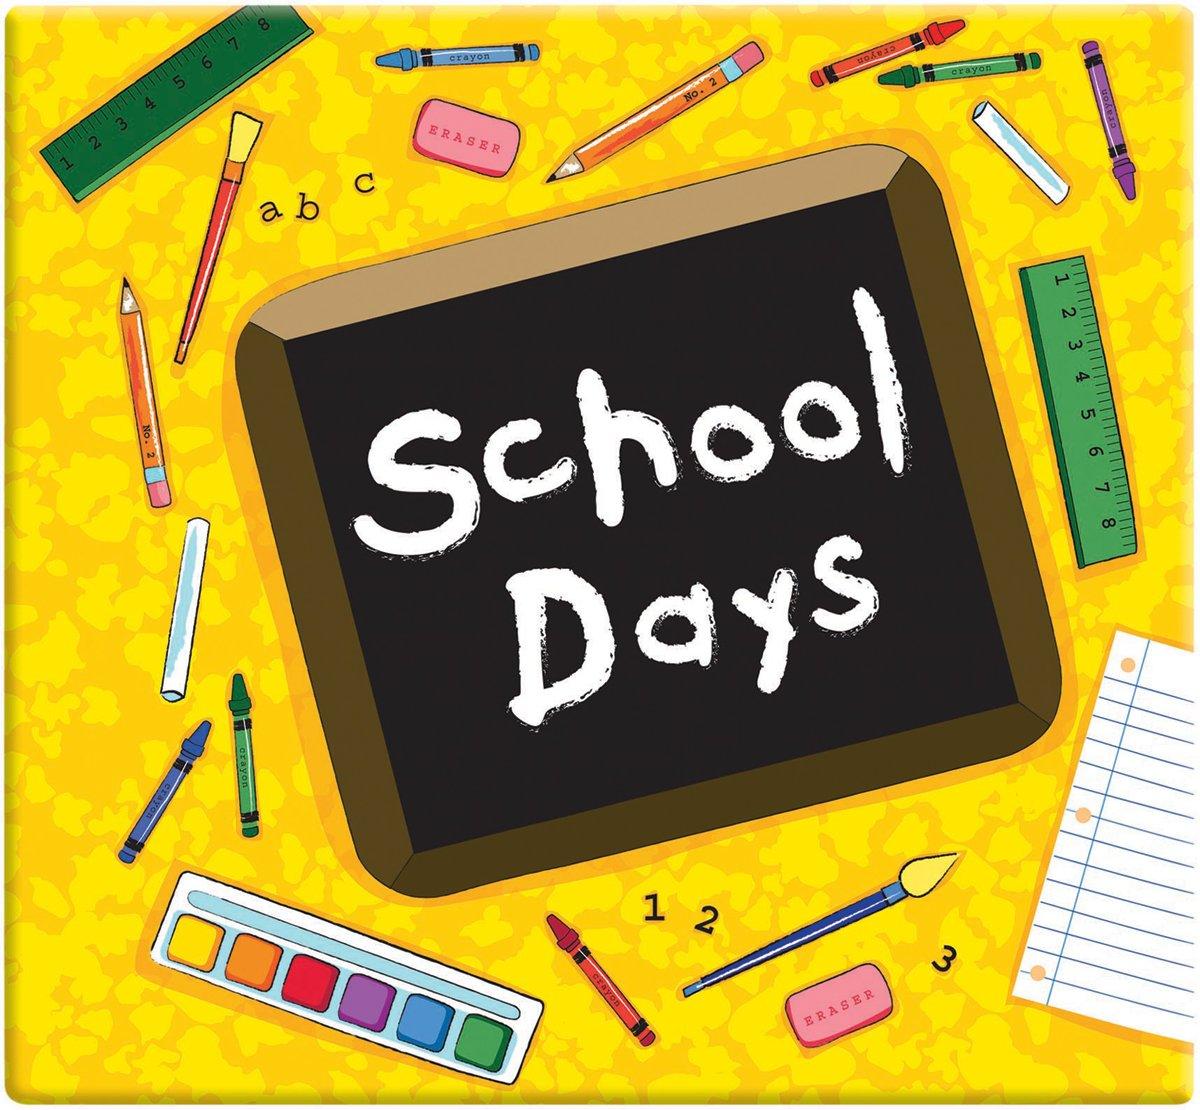 MBI School Days Album, 12 by 12-Inch, Yellow 849159